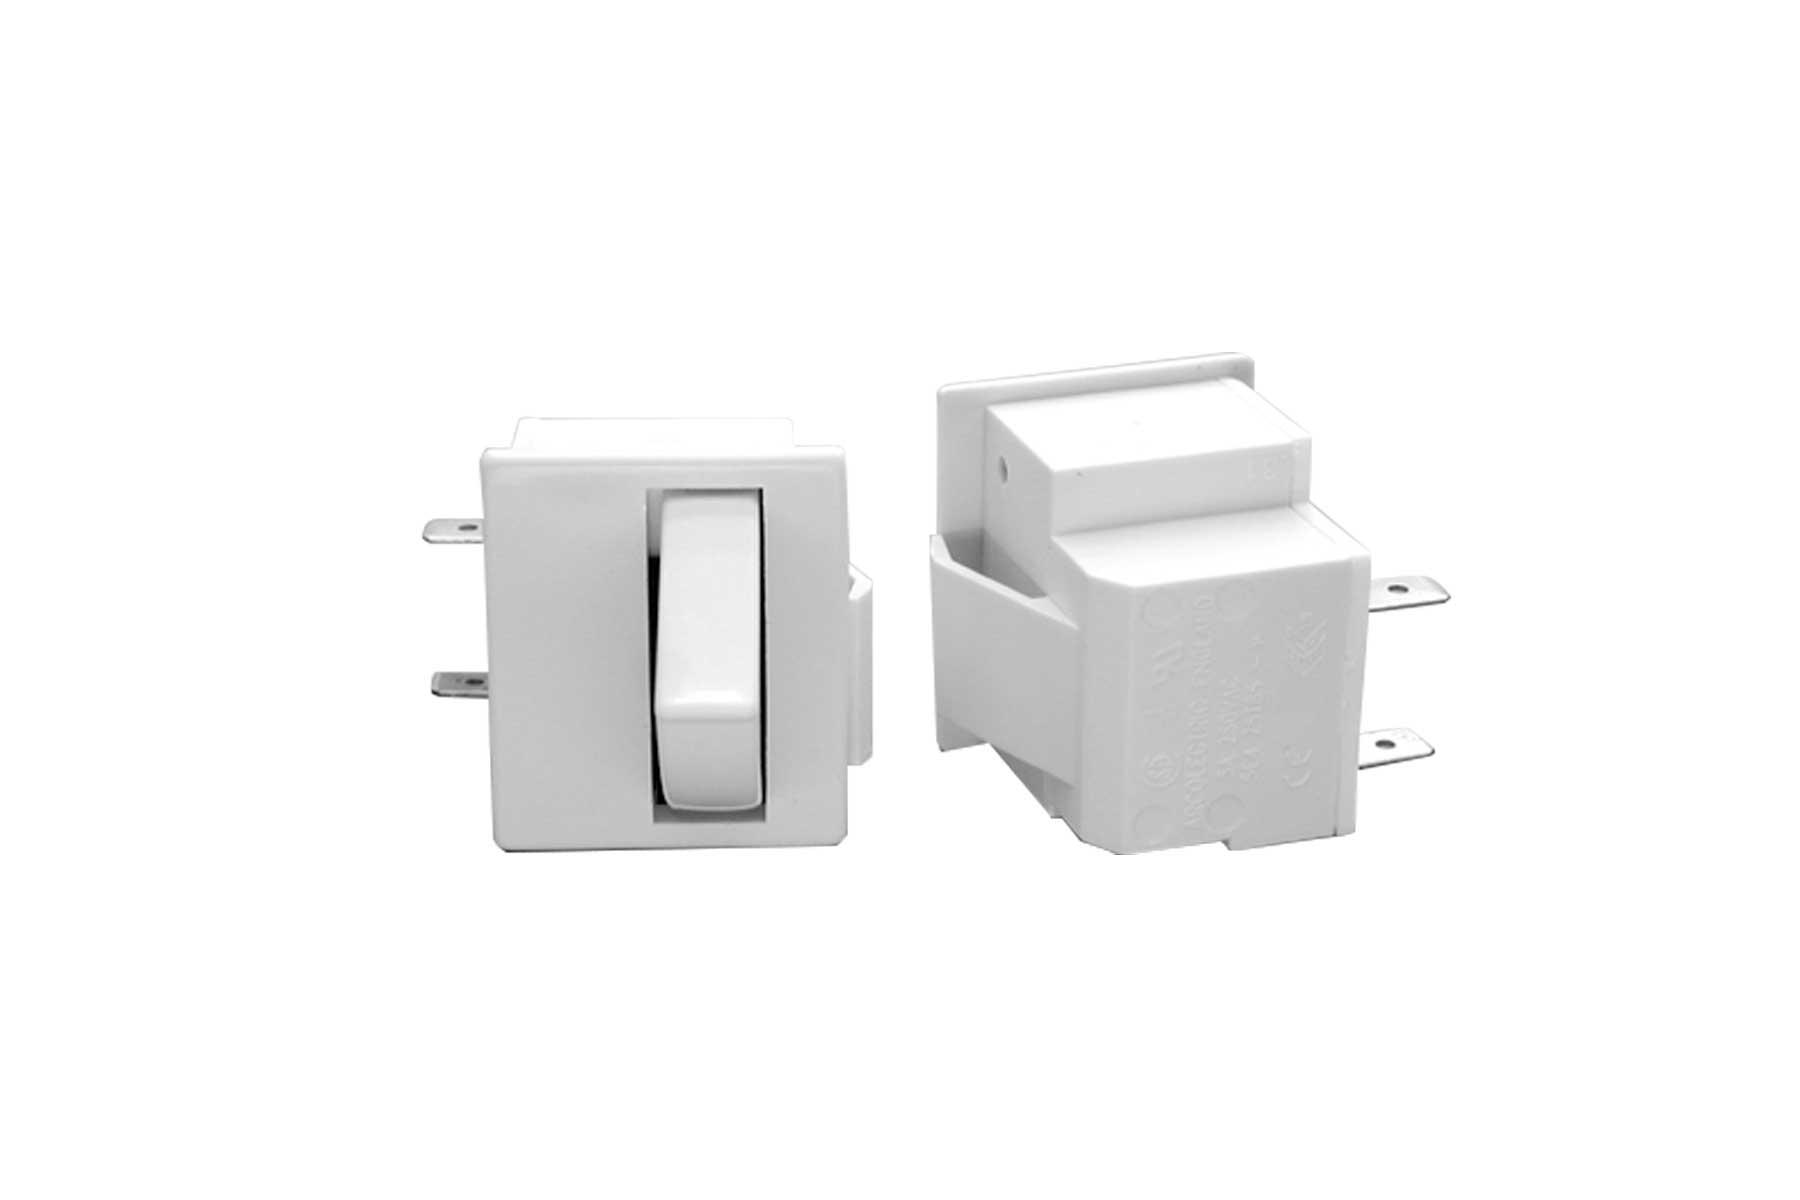 SPST Push Button Fridge Lamp Switch